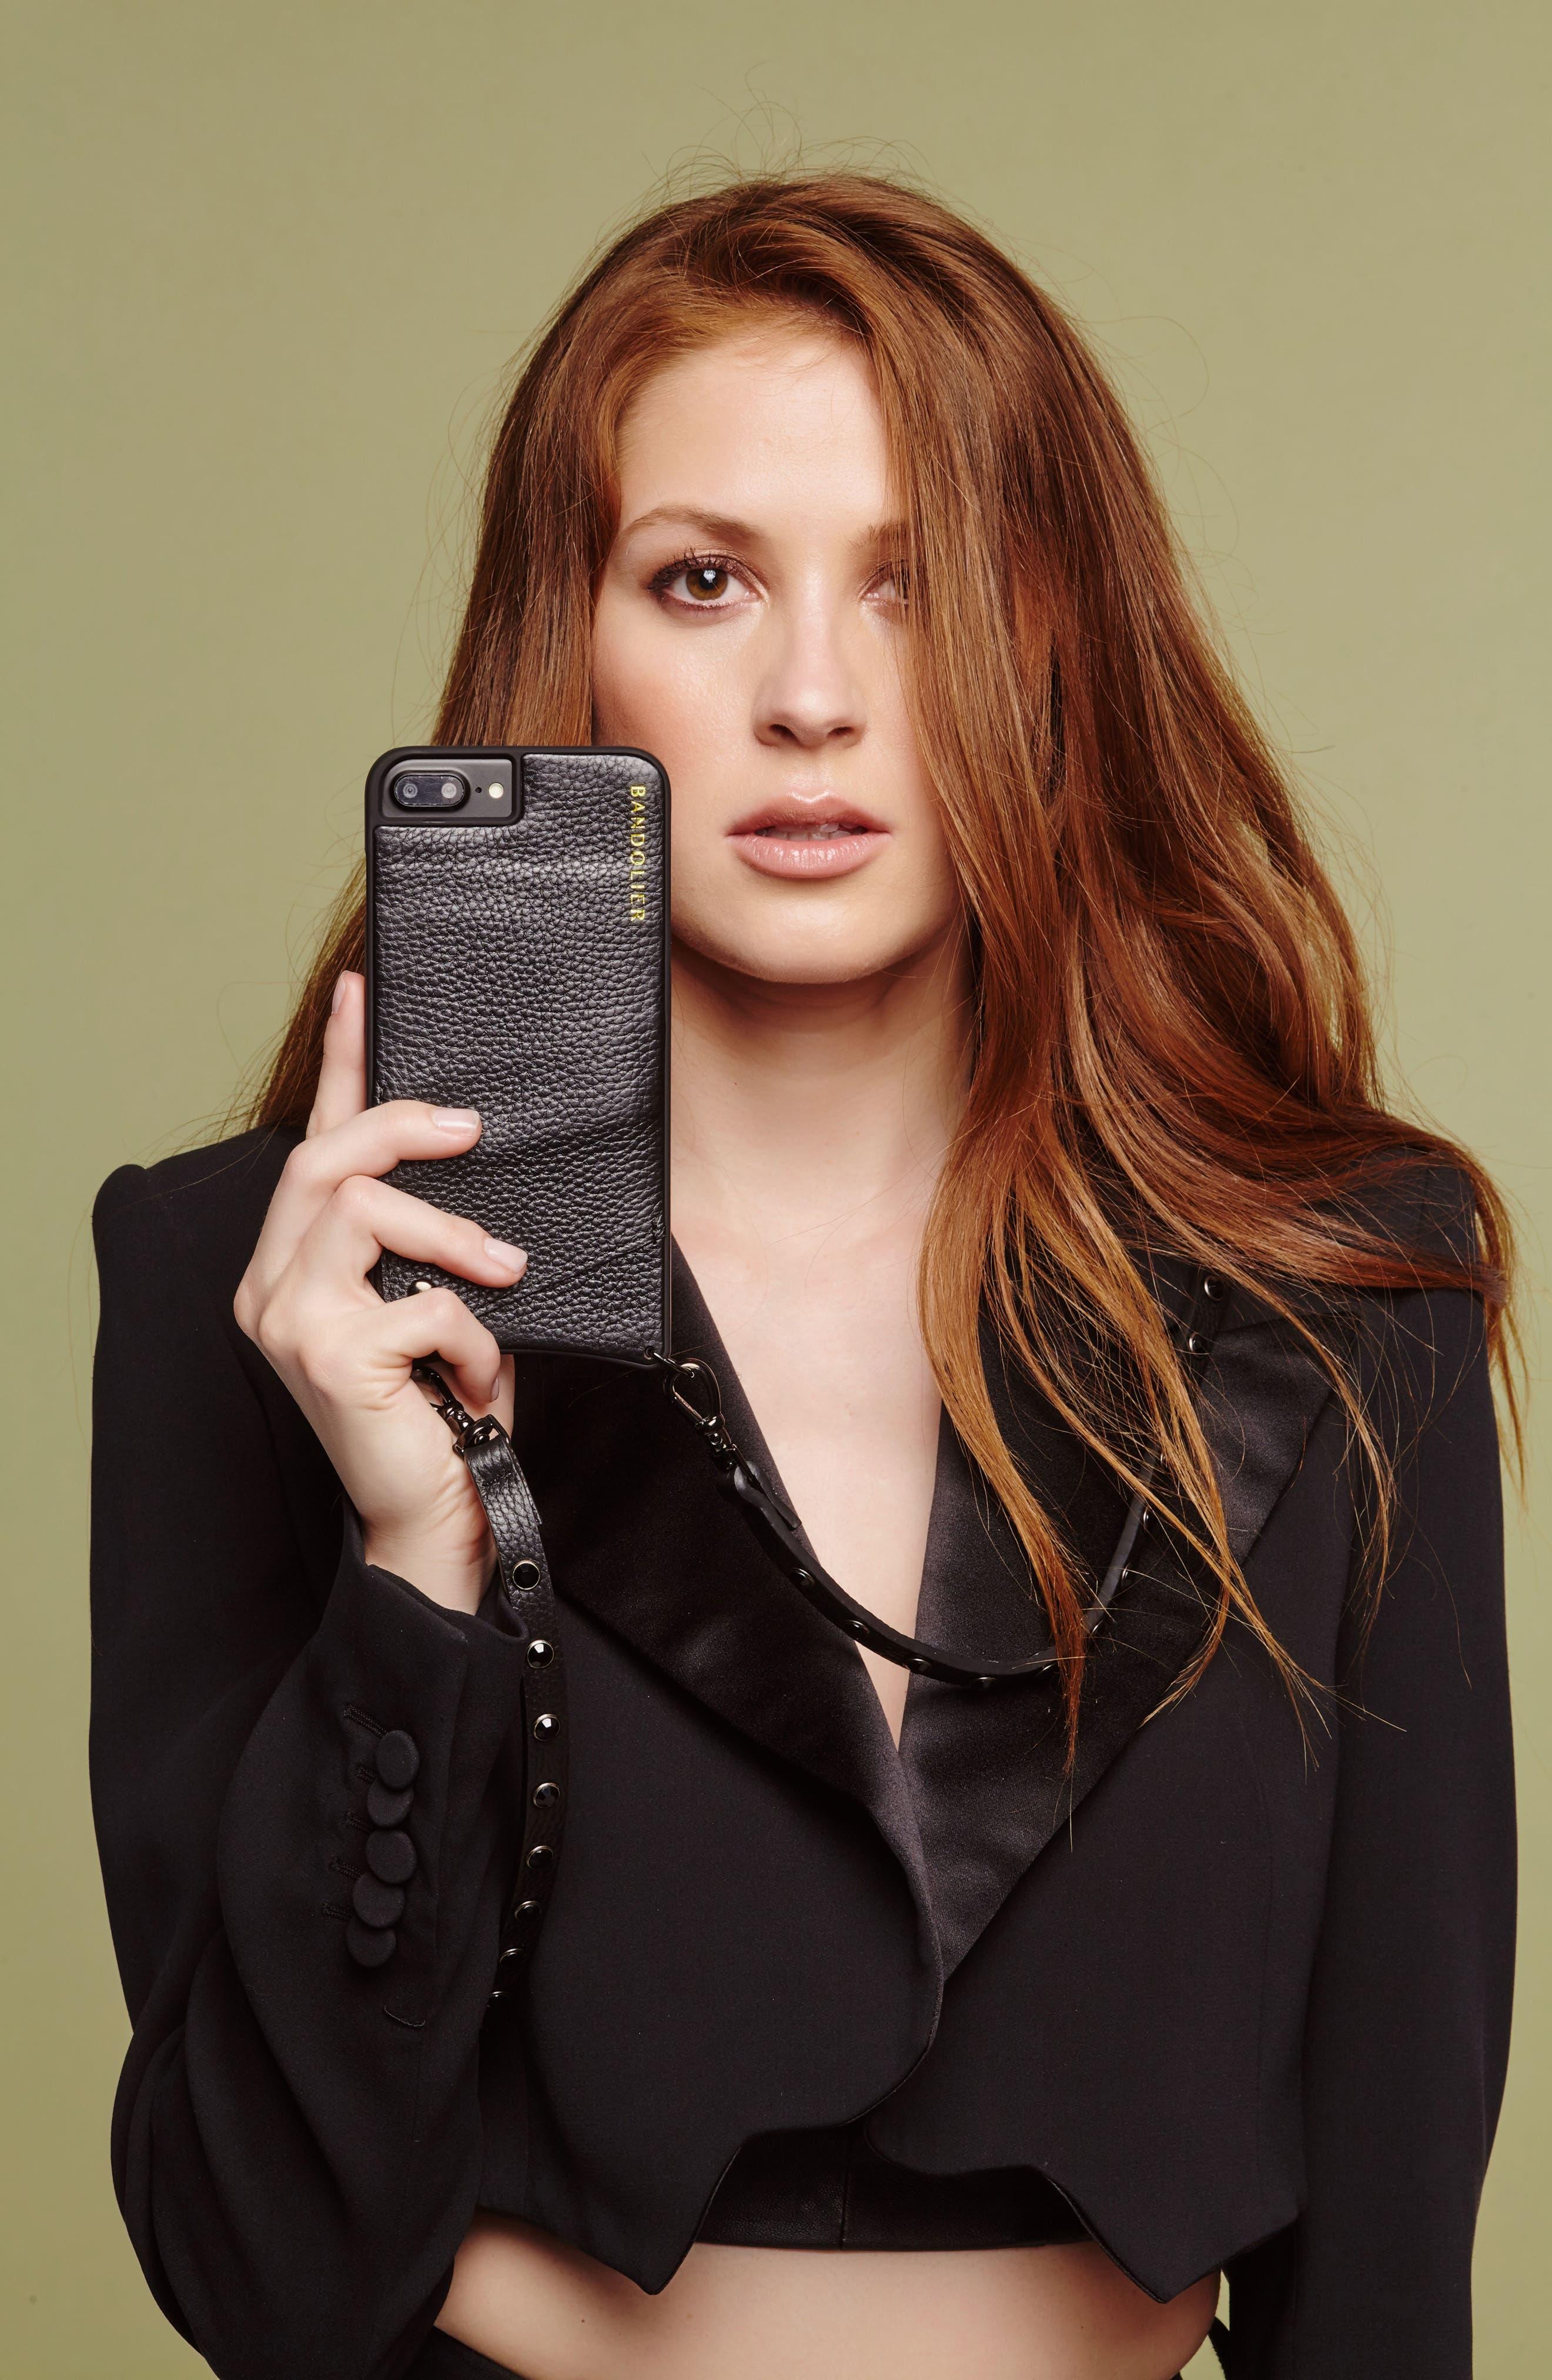 Jules Leather iPhone 6/7/8 & 6/7/8 Plus Crossbody Case,                             Alternate thumbnail 9, color,                             Black/ Pewter